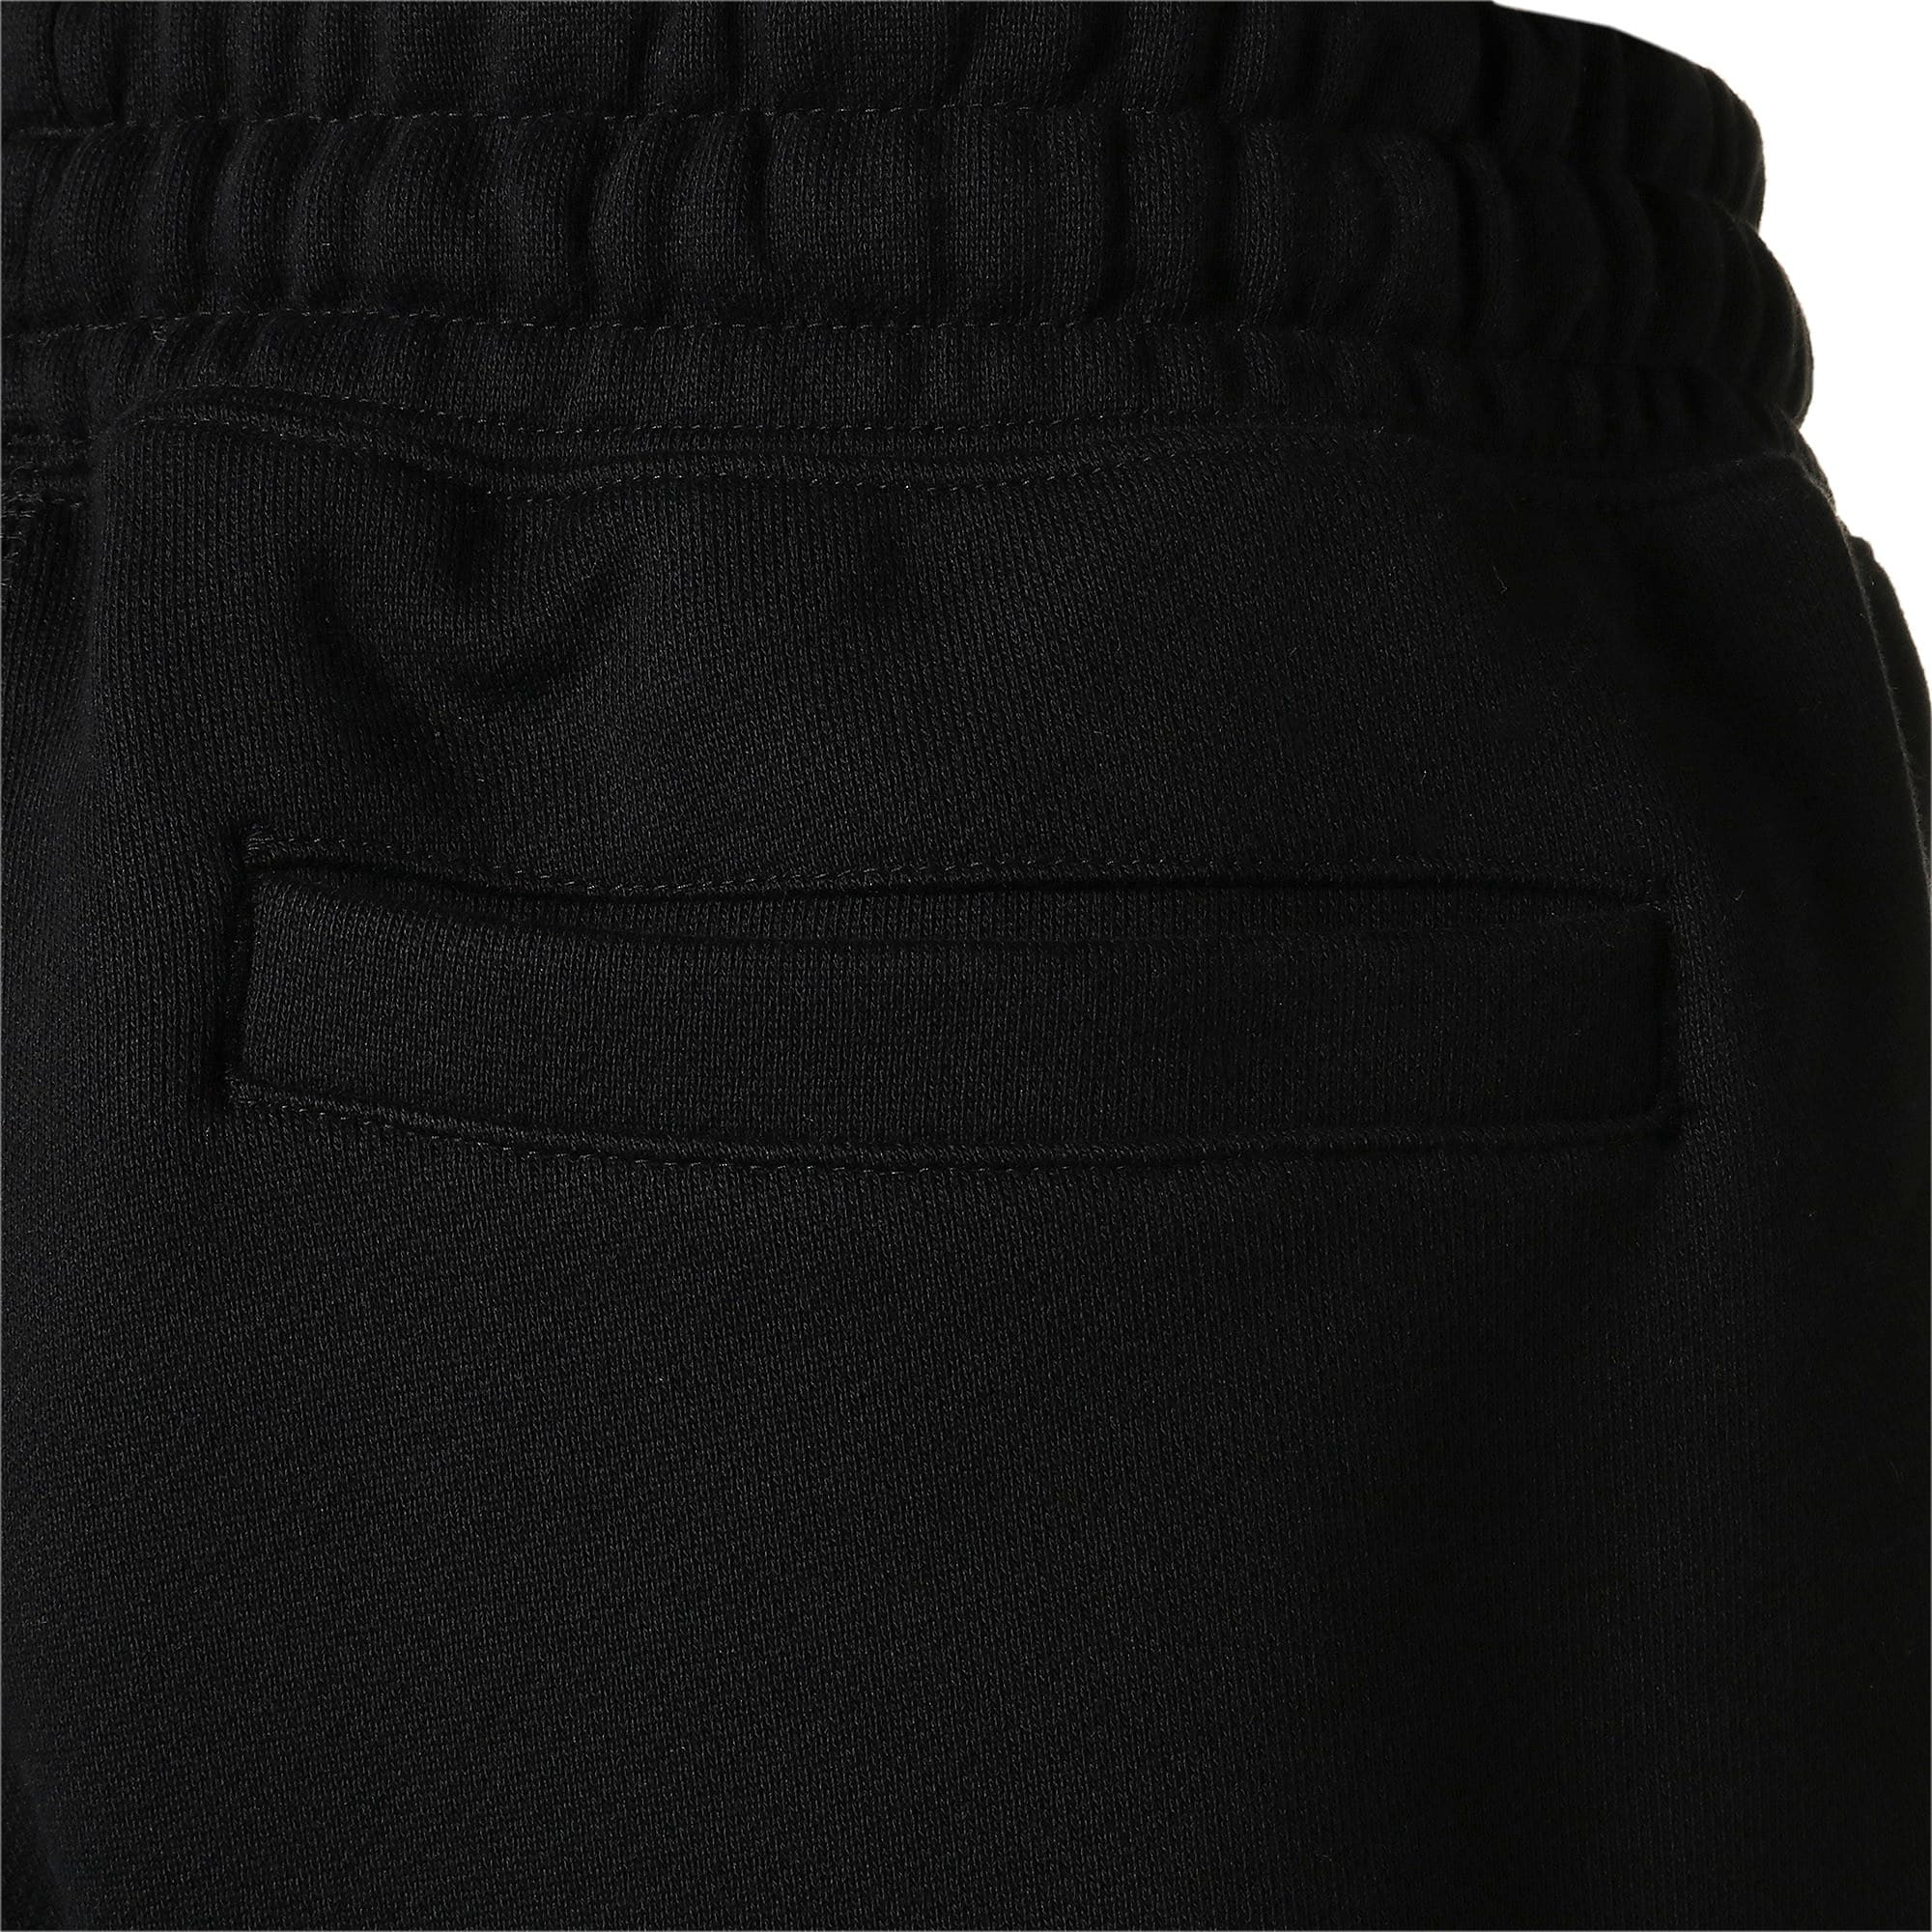 Thumbnail 8 of HEAVY CLASSICS パンツ, Cotton Black, medium-JPN